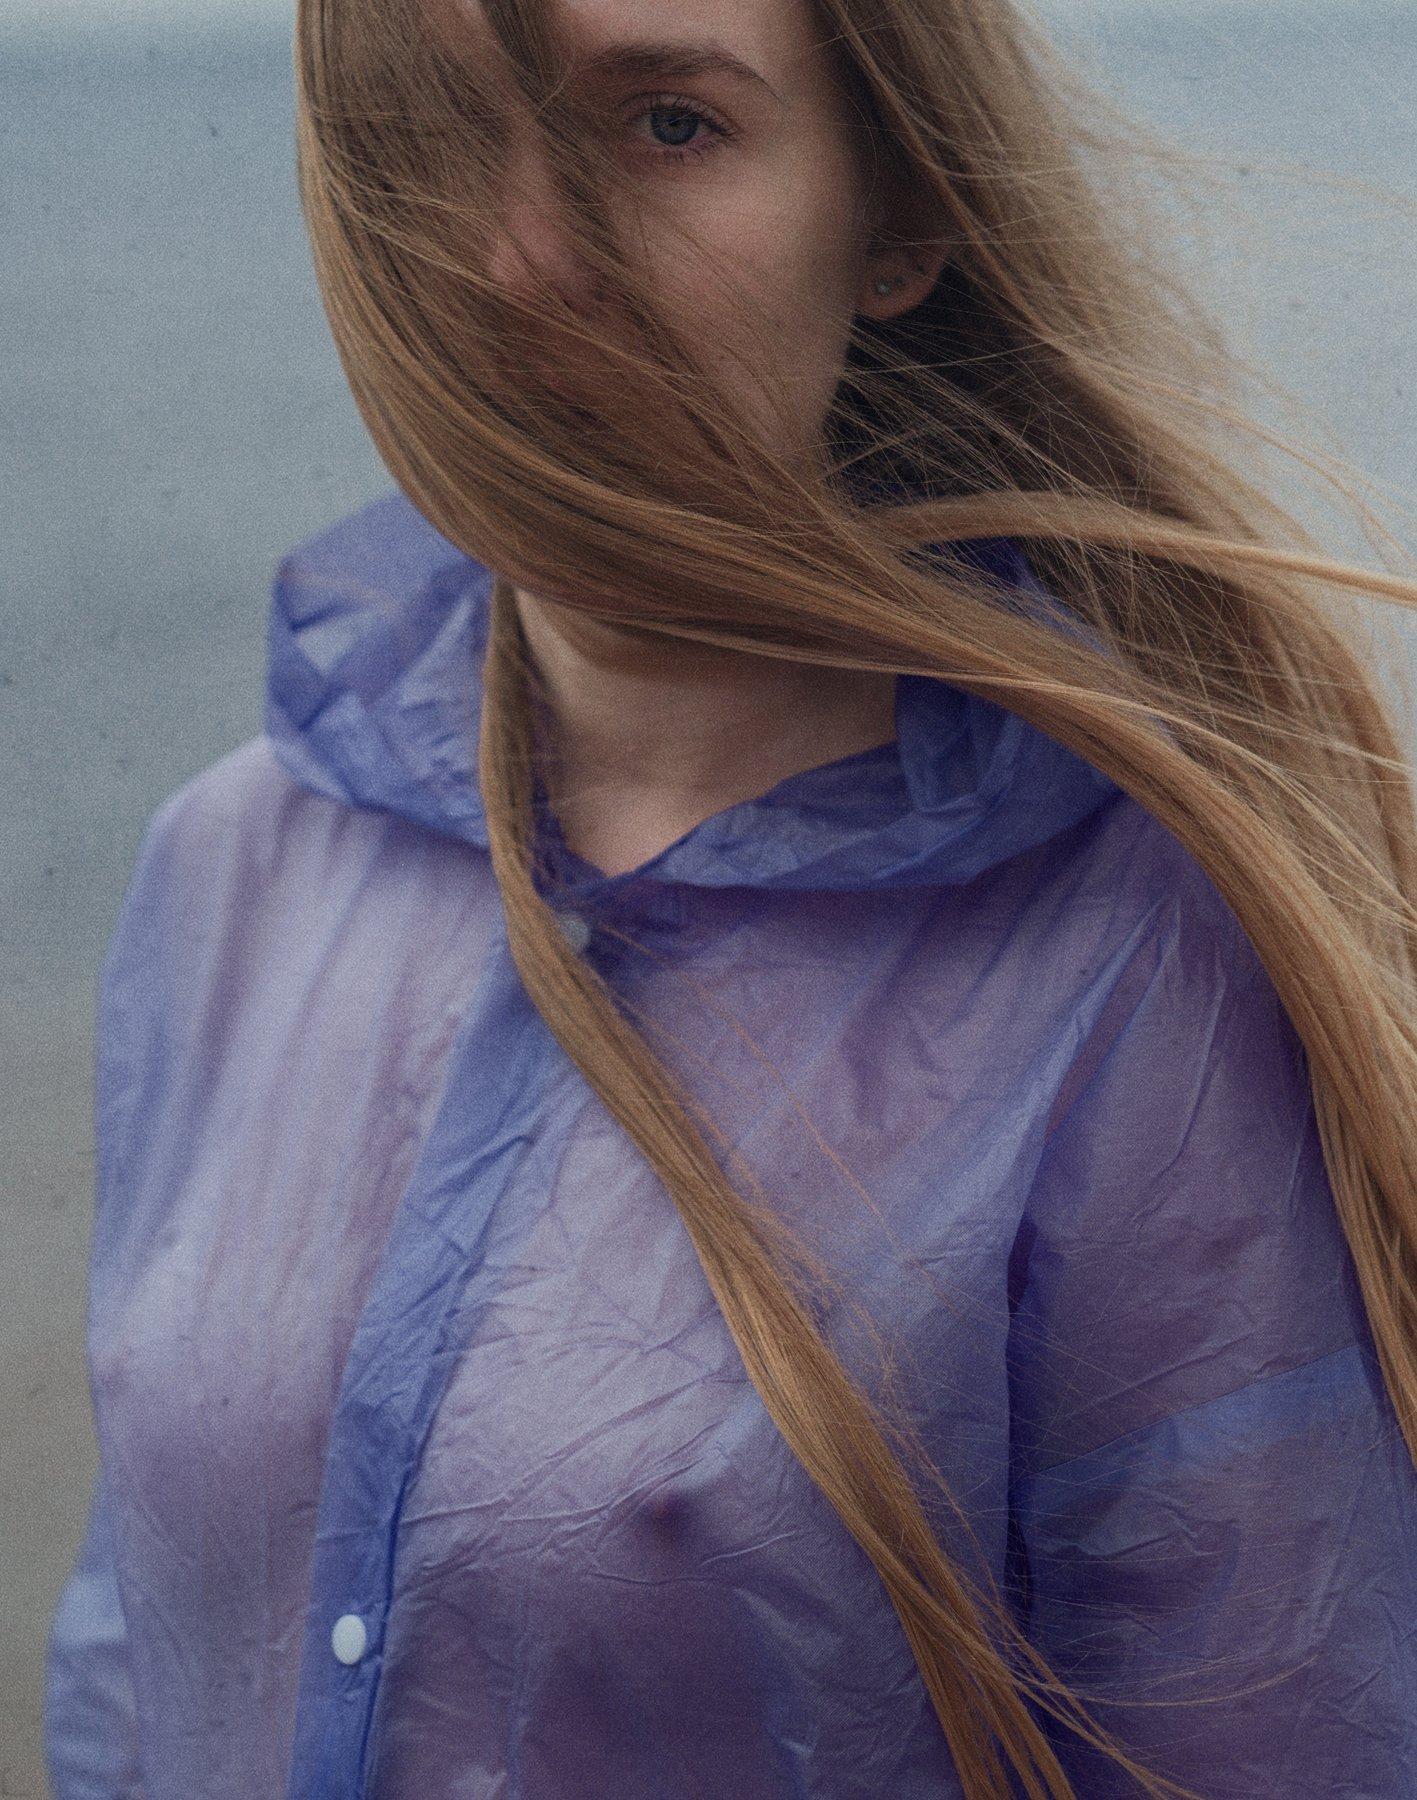 girl, saint-petersburg, portrait, nude, wind, spb, cold, Роман Филиппов